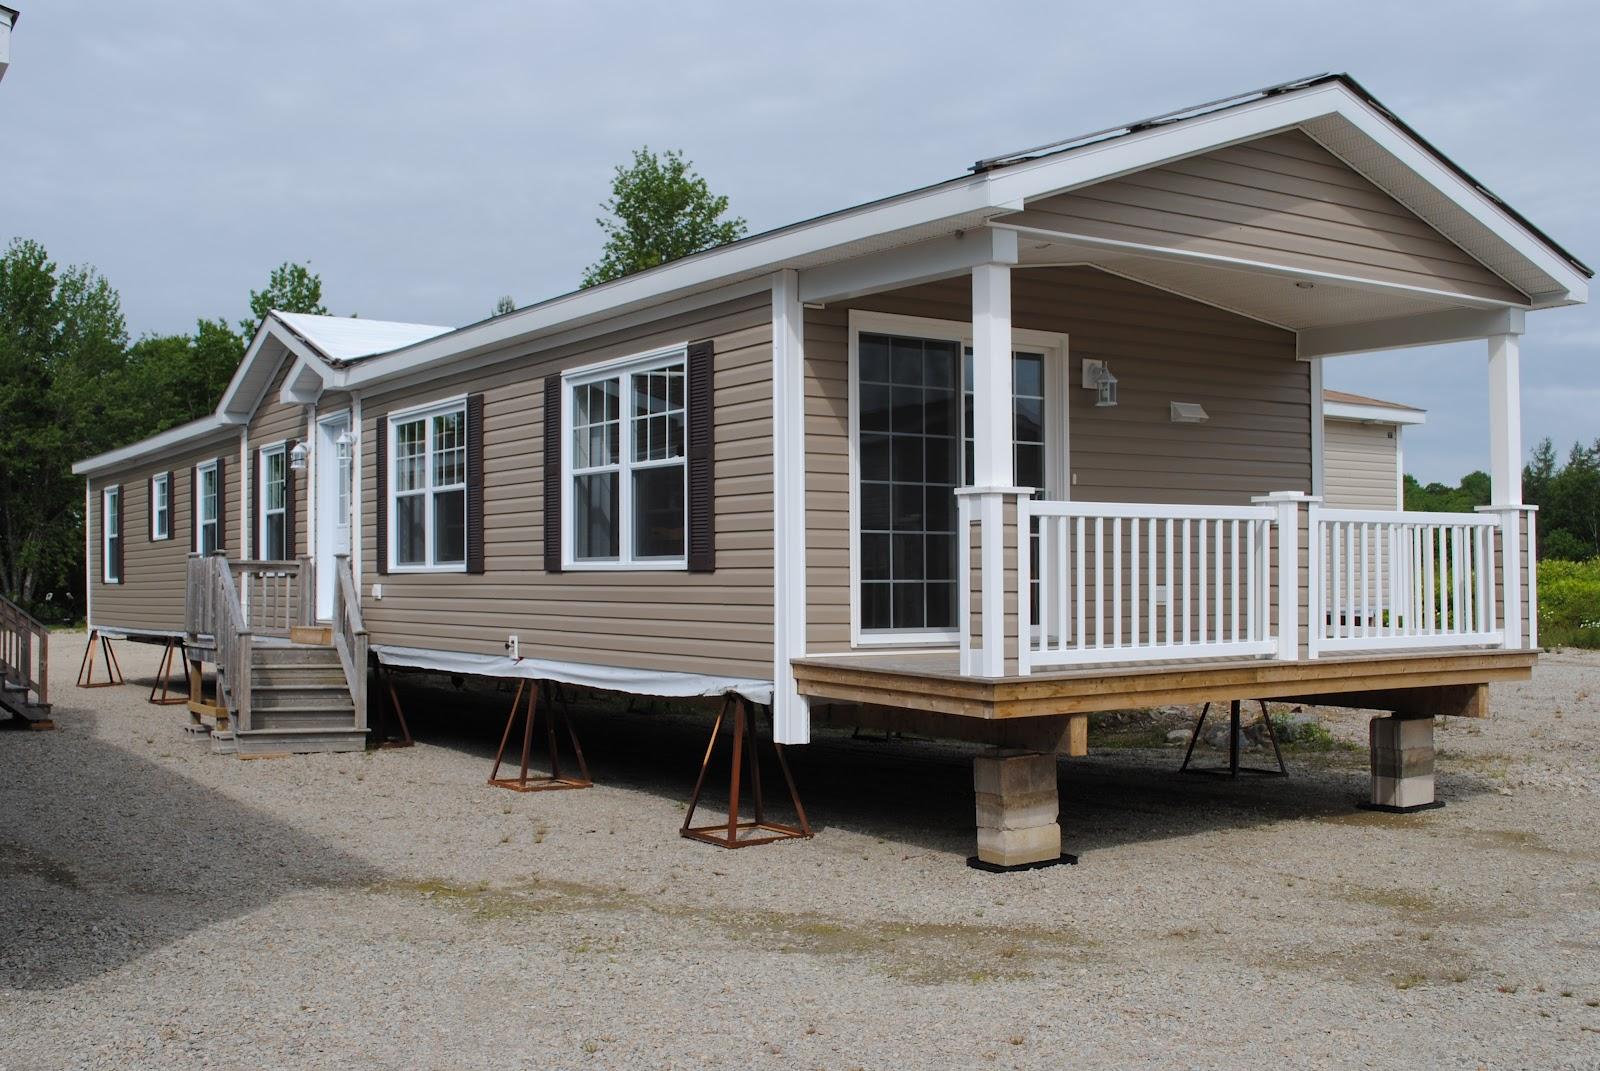 Gold River Homes - Custom Built Manufactured Homes